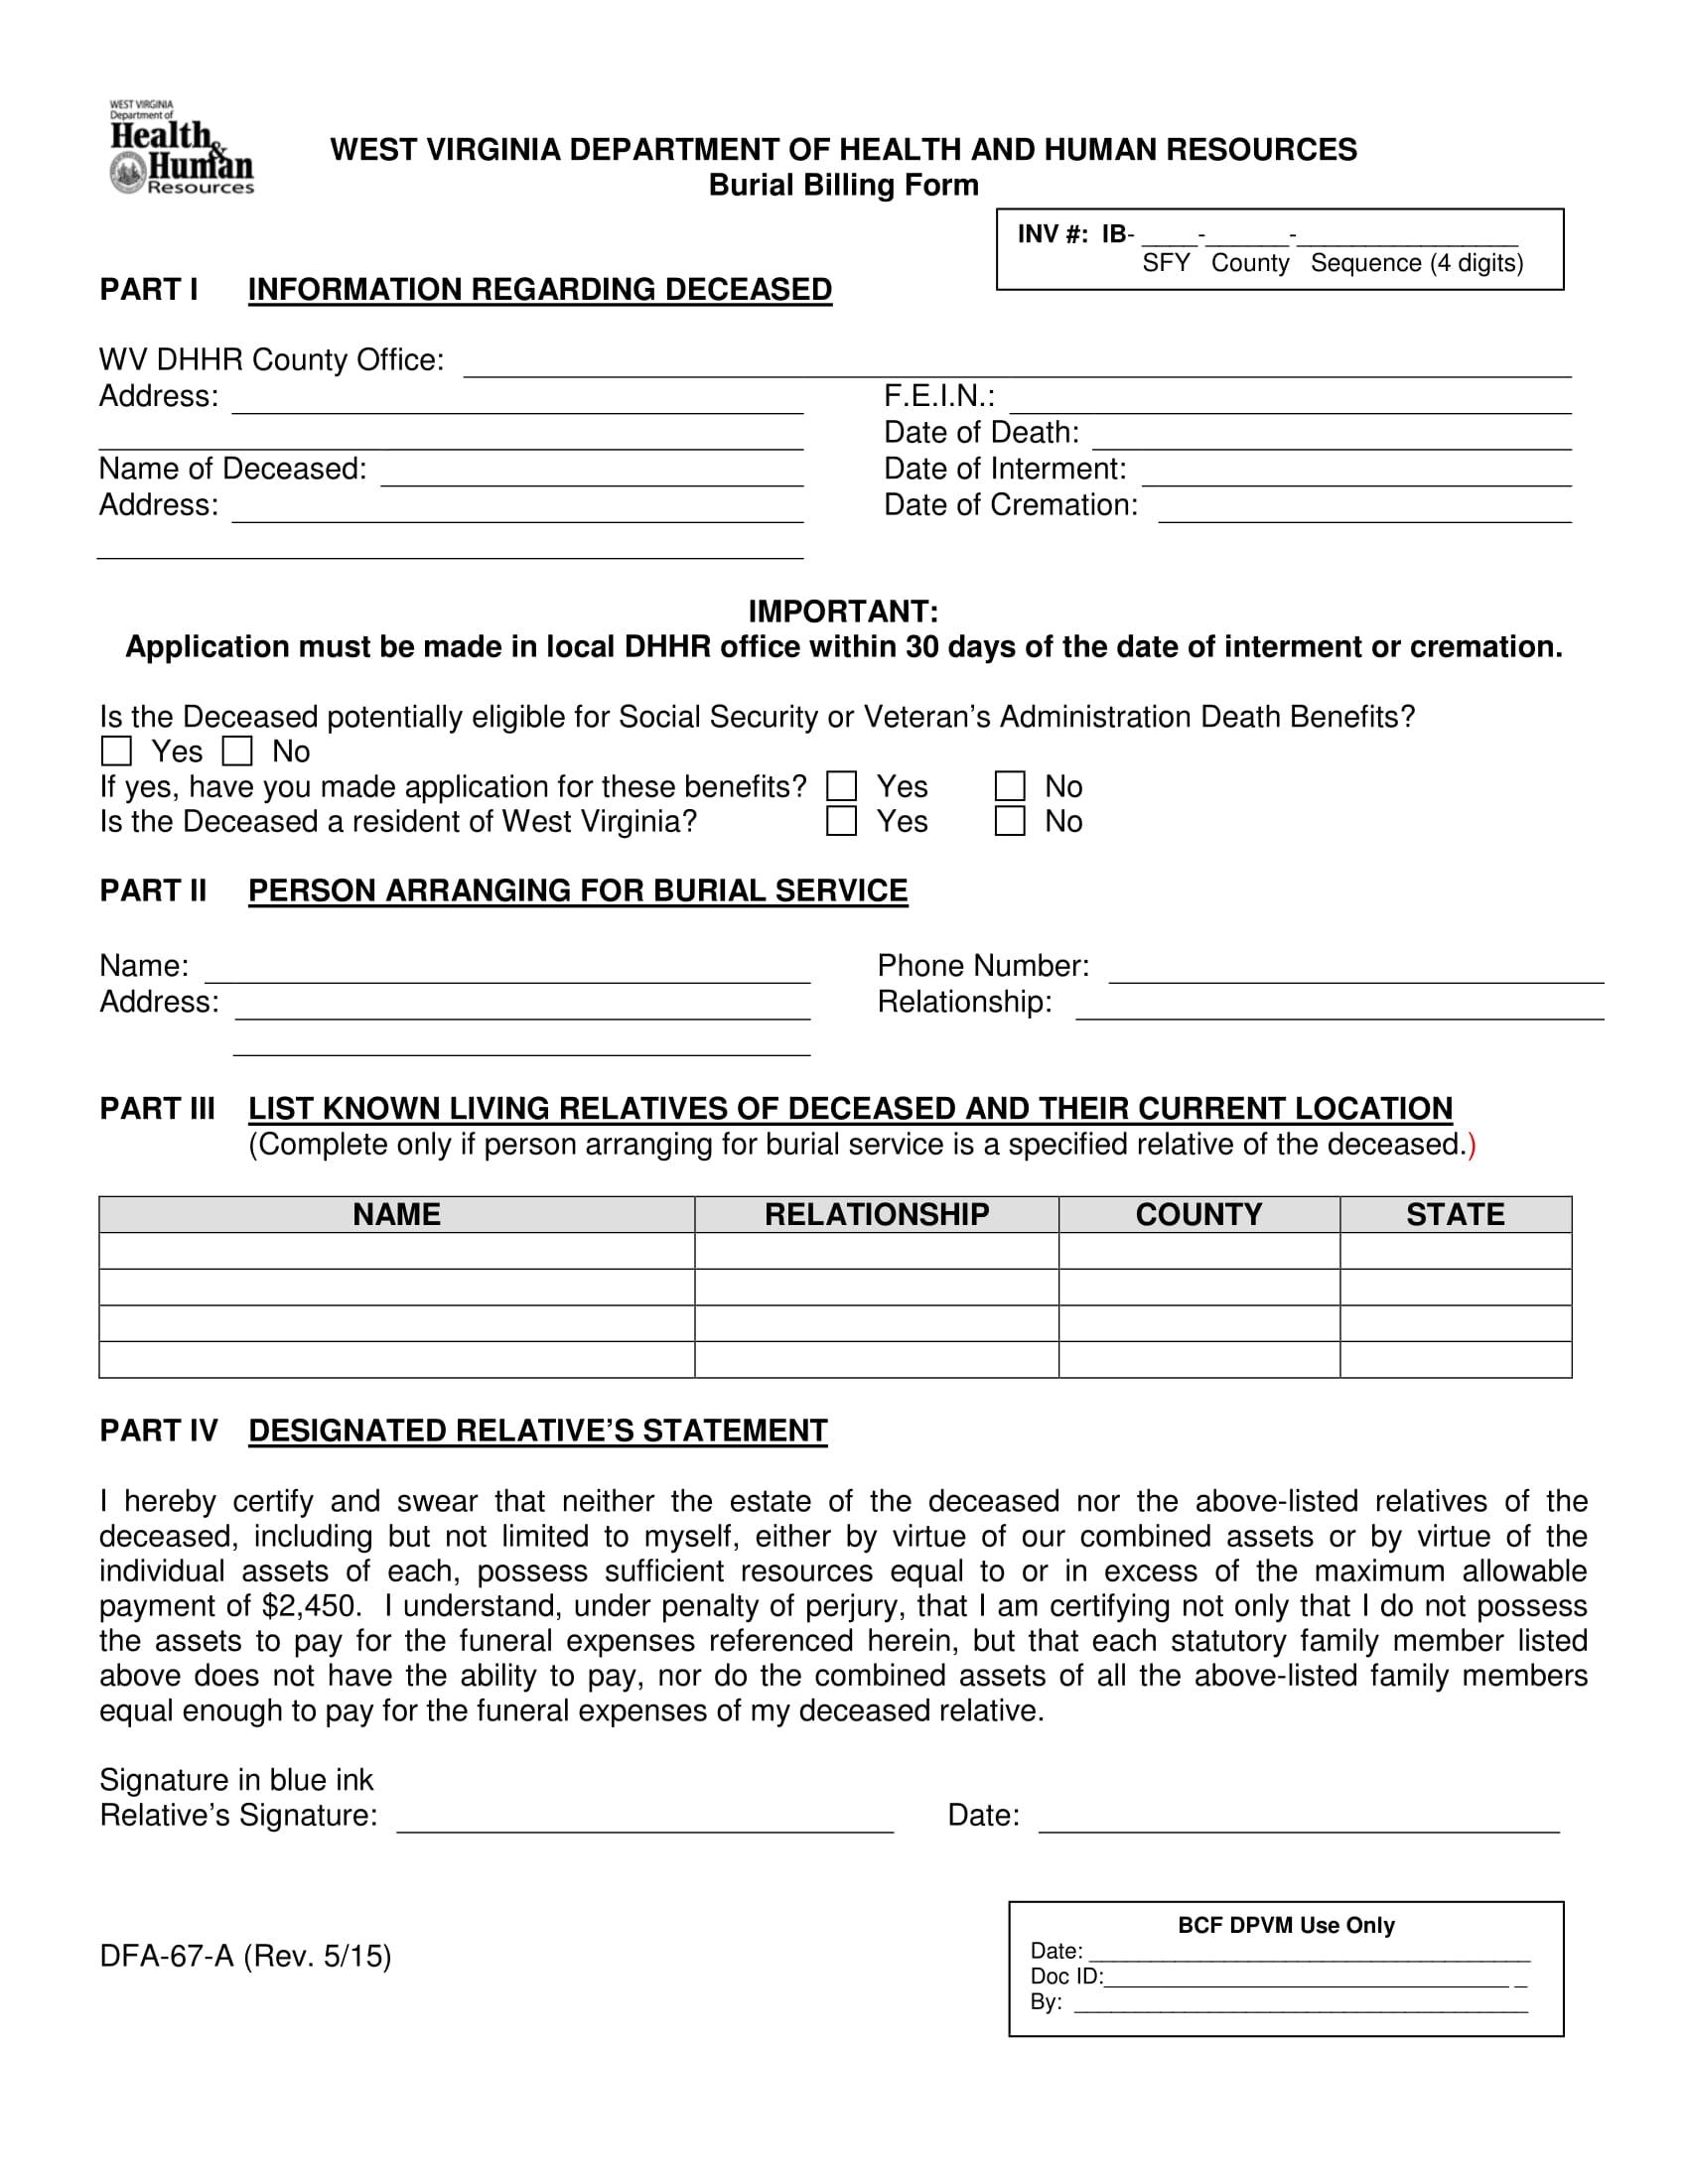 14 billing statement form samples free word pdf format download